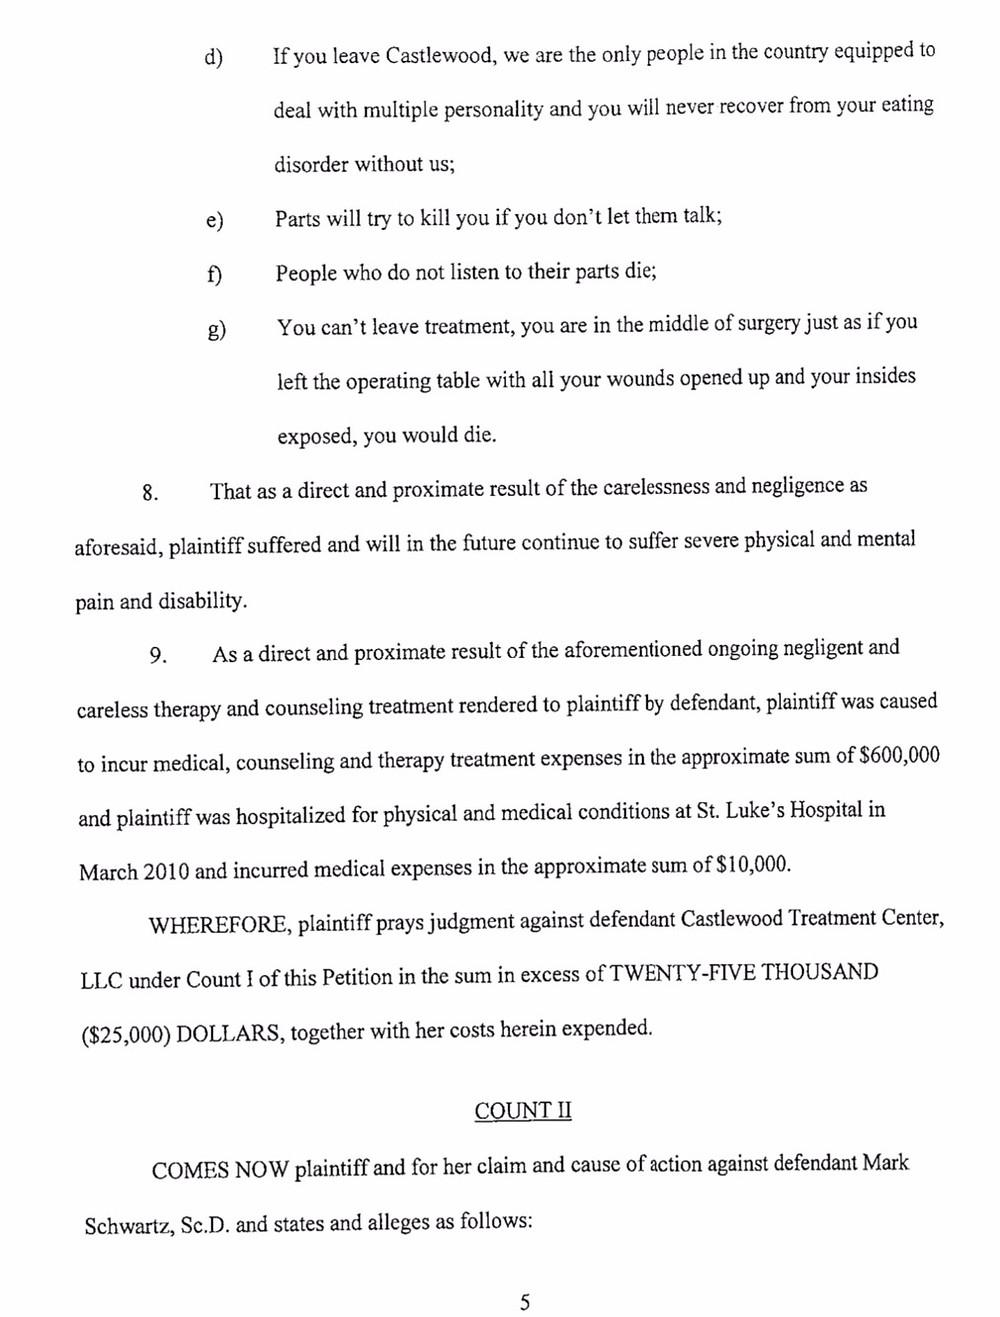 Castlewood Lawsuit/Mark Schwartz #2 - Leslie Thompson - page 5